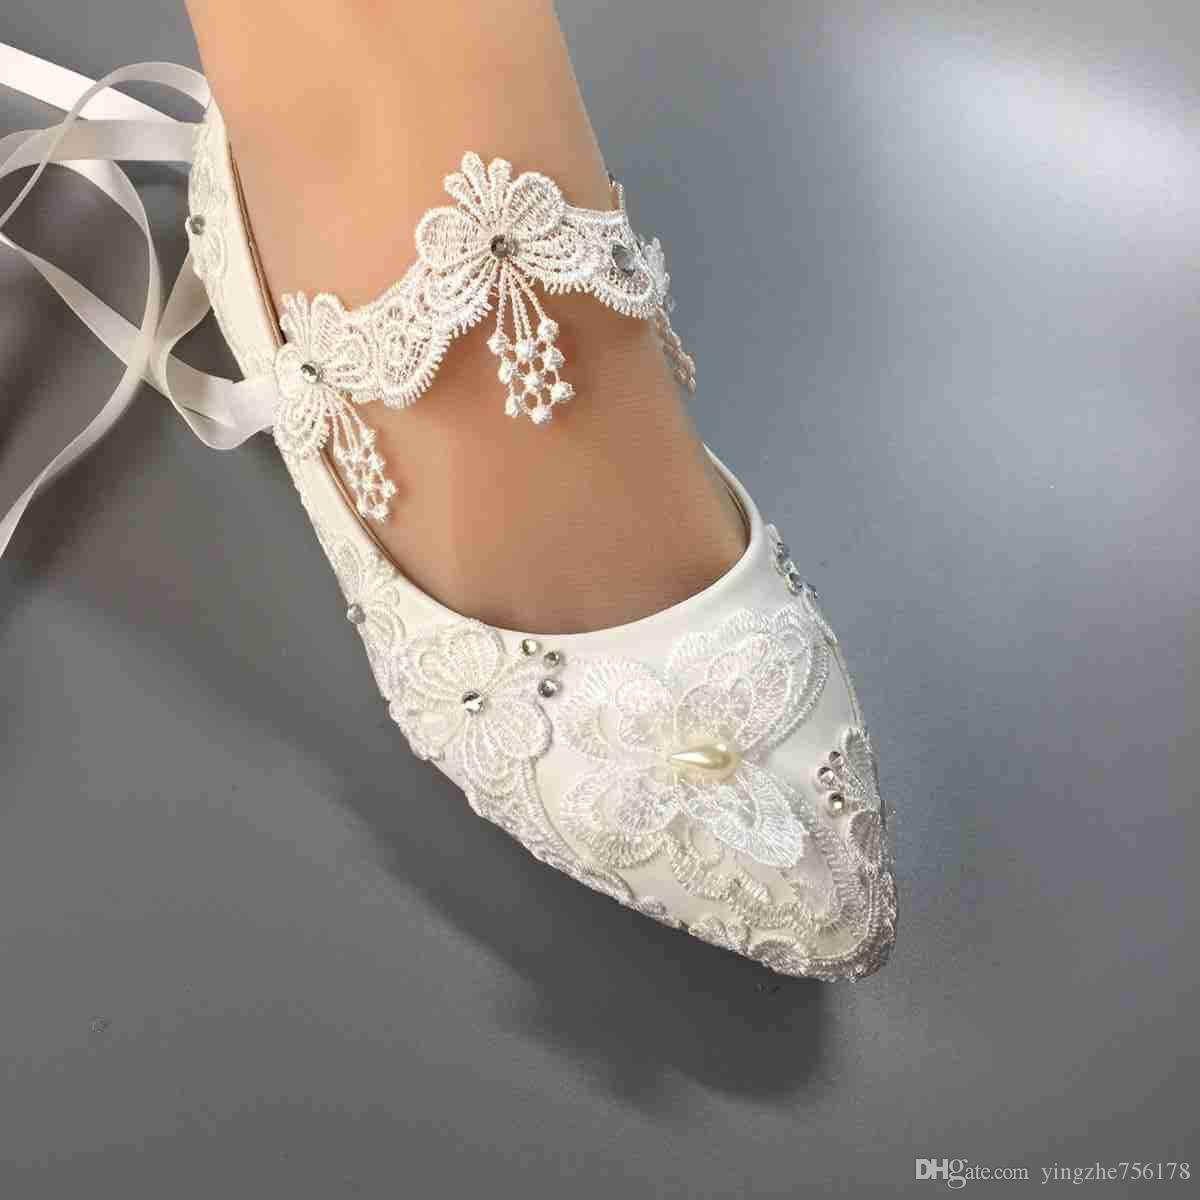 Women Wedding Flat Shoes Waterproof White Lace Bride Dresses Heel Diamond Manual Bridal Size Eu 35 42 Mother Of Nude: Dress Flat Wedding Shoes At Websimilar.org